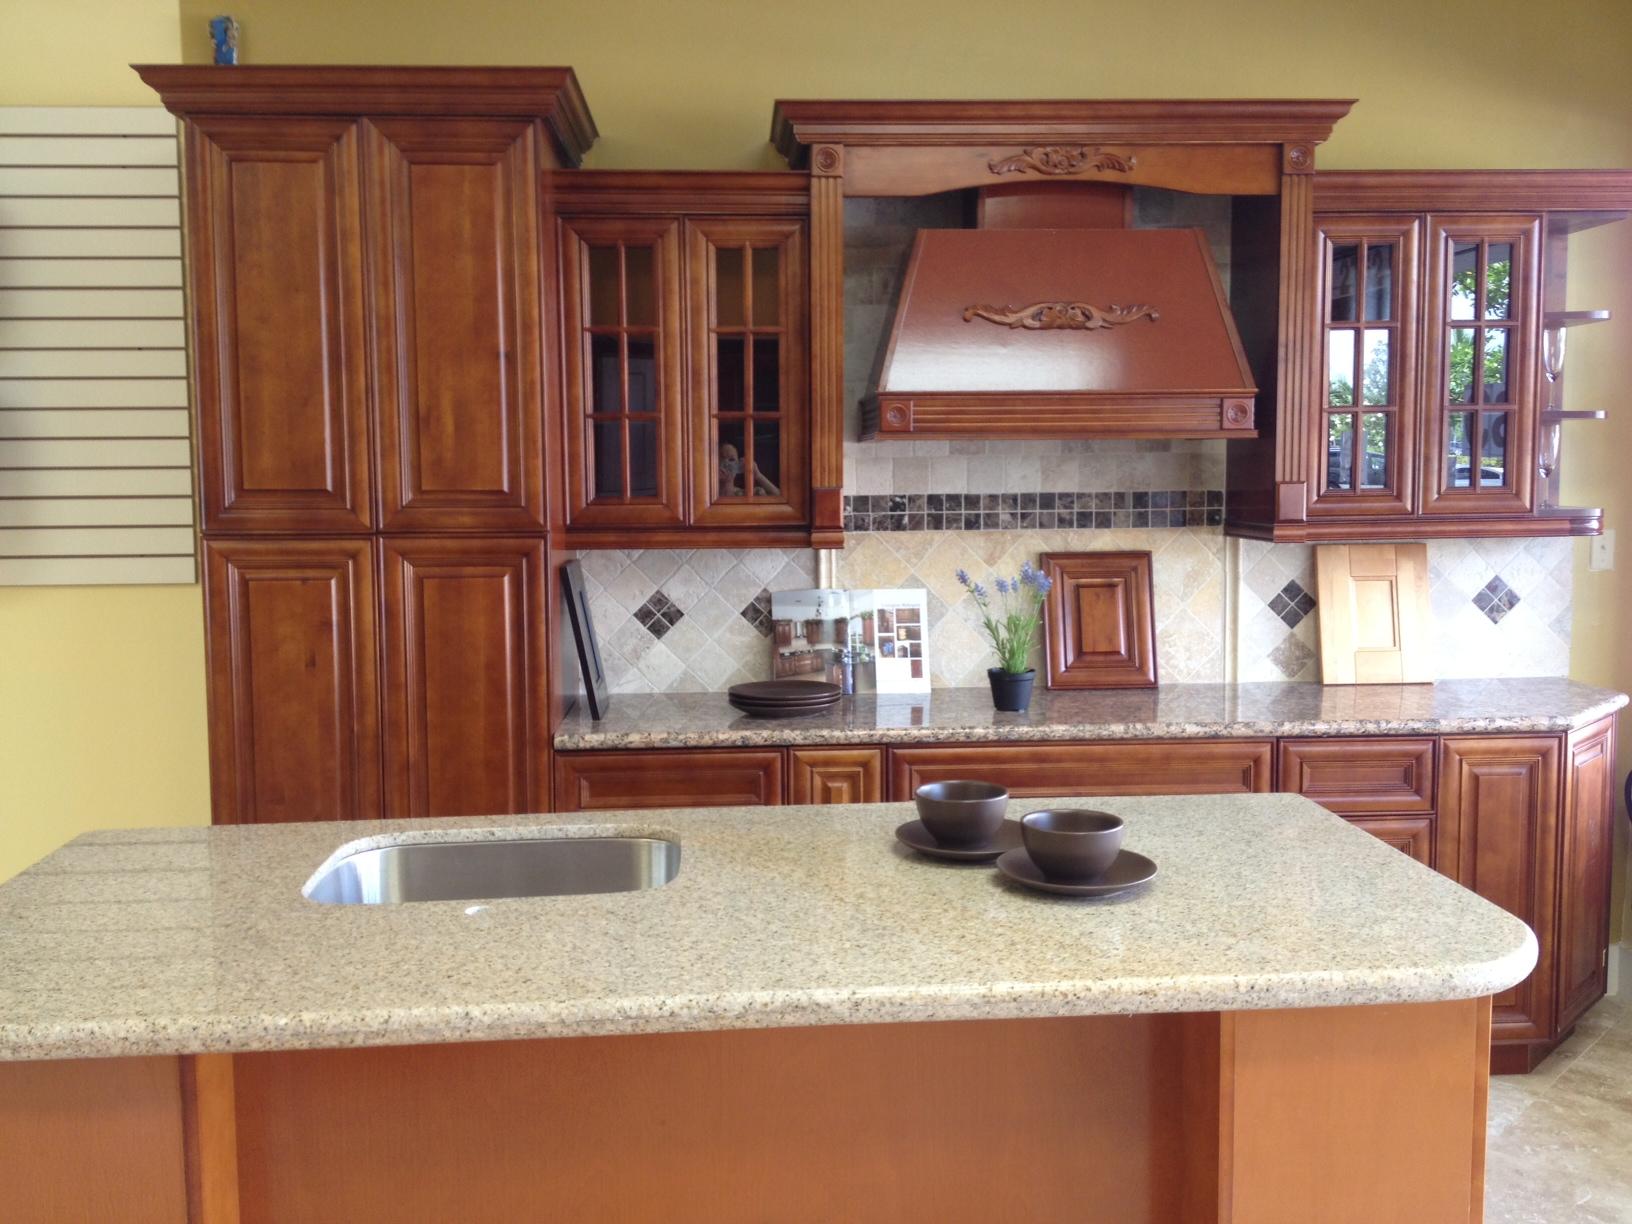 tops kitchen cabinets pompano drano for sink gallery and granite countertops